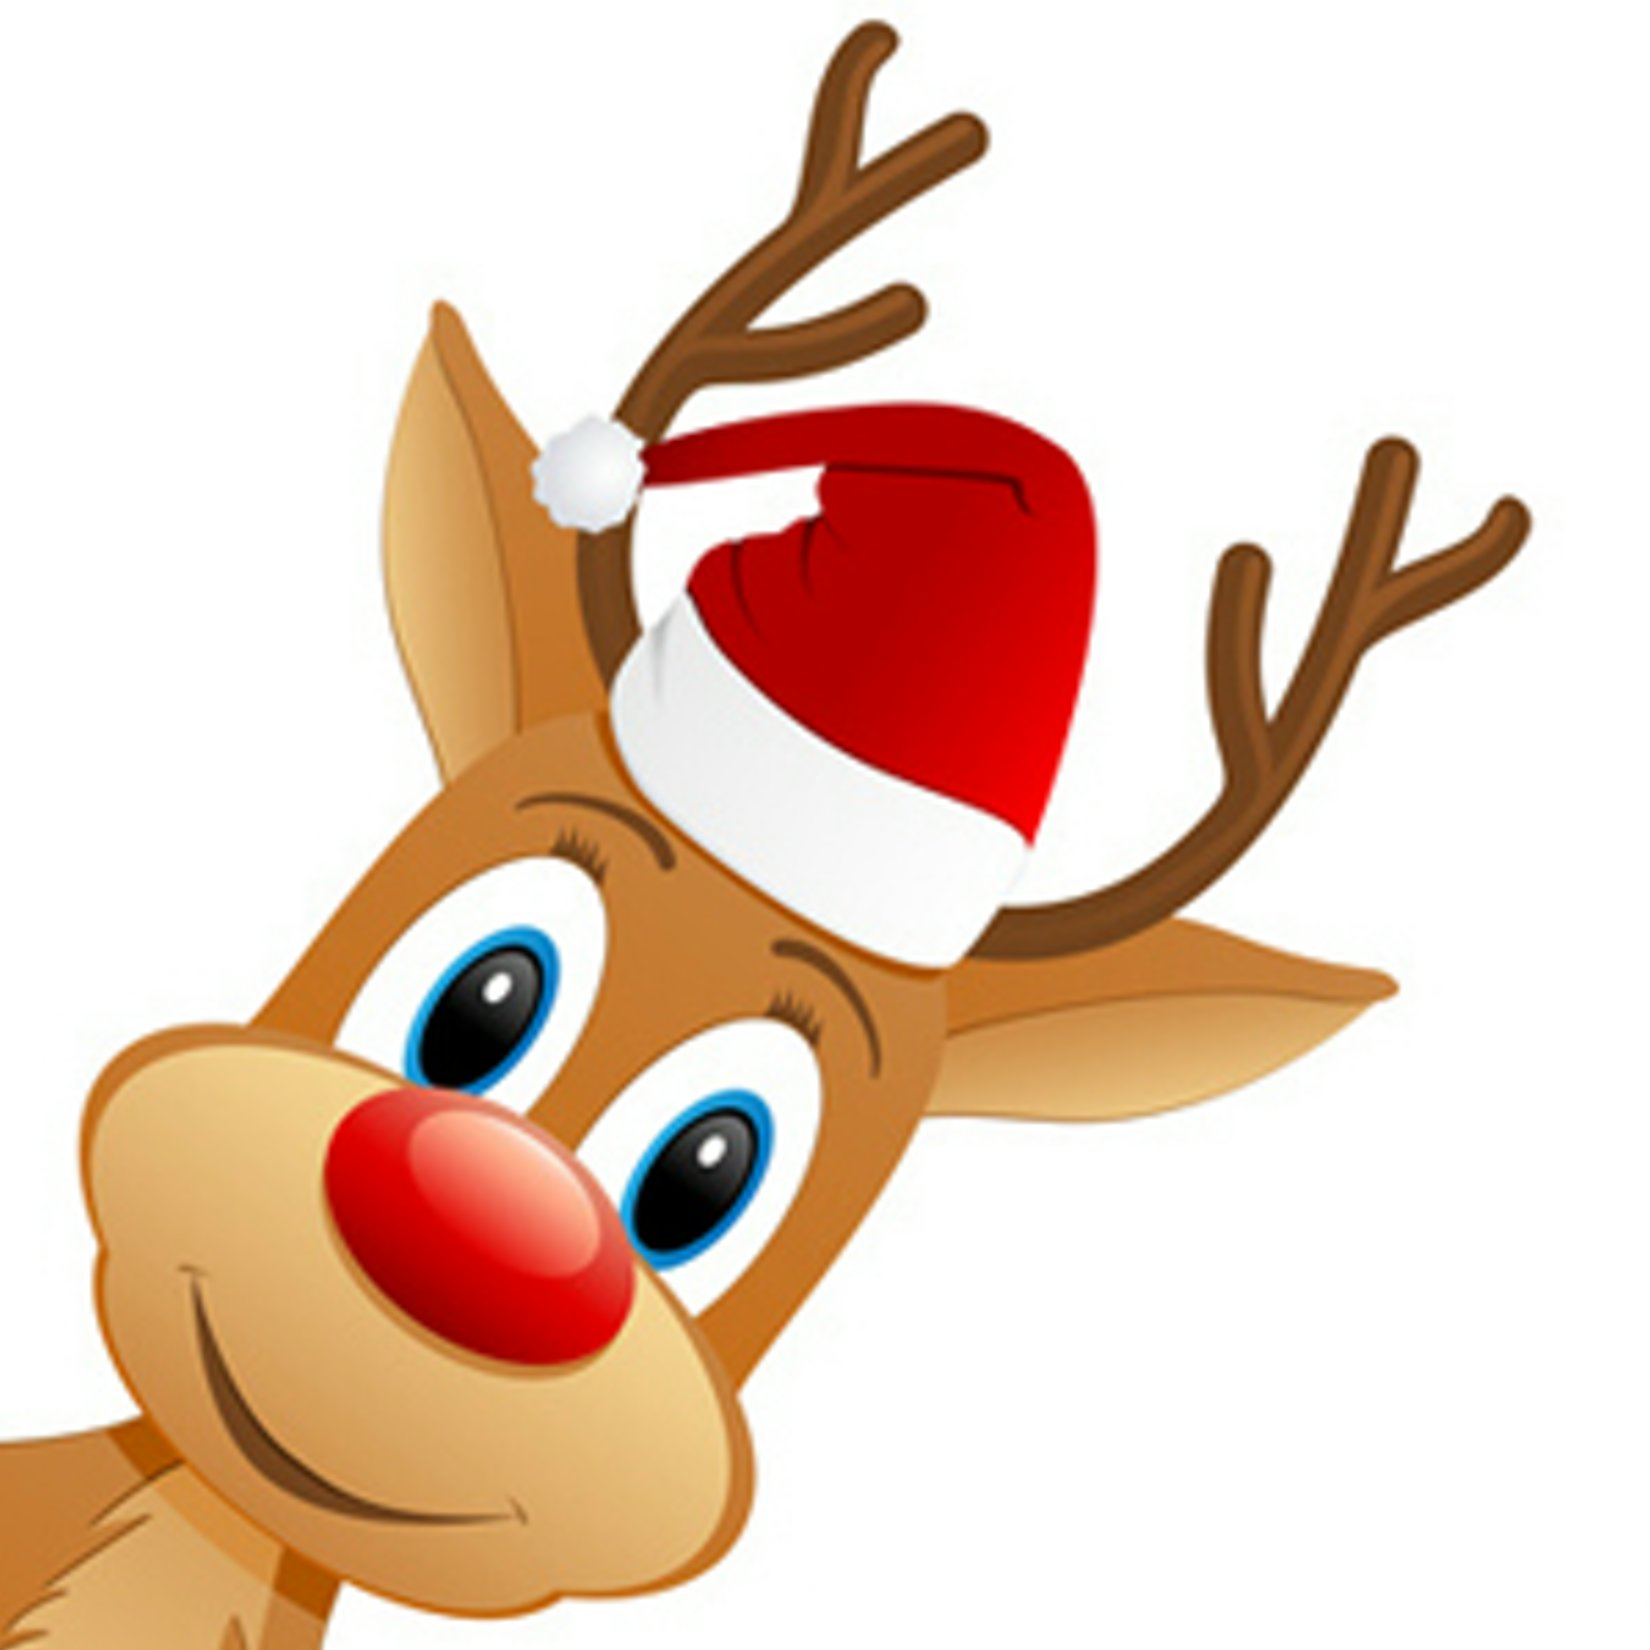 Frohes neues Jahr / Καλή Χρονιά / Happy new year 2021 @ YouTube